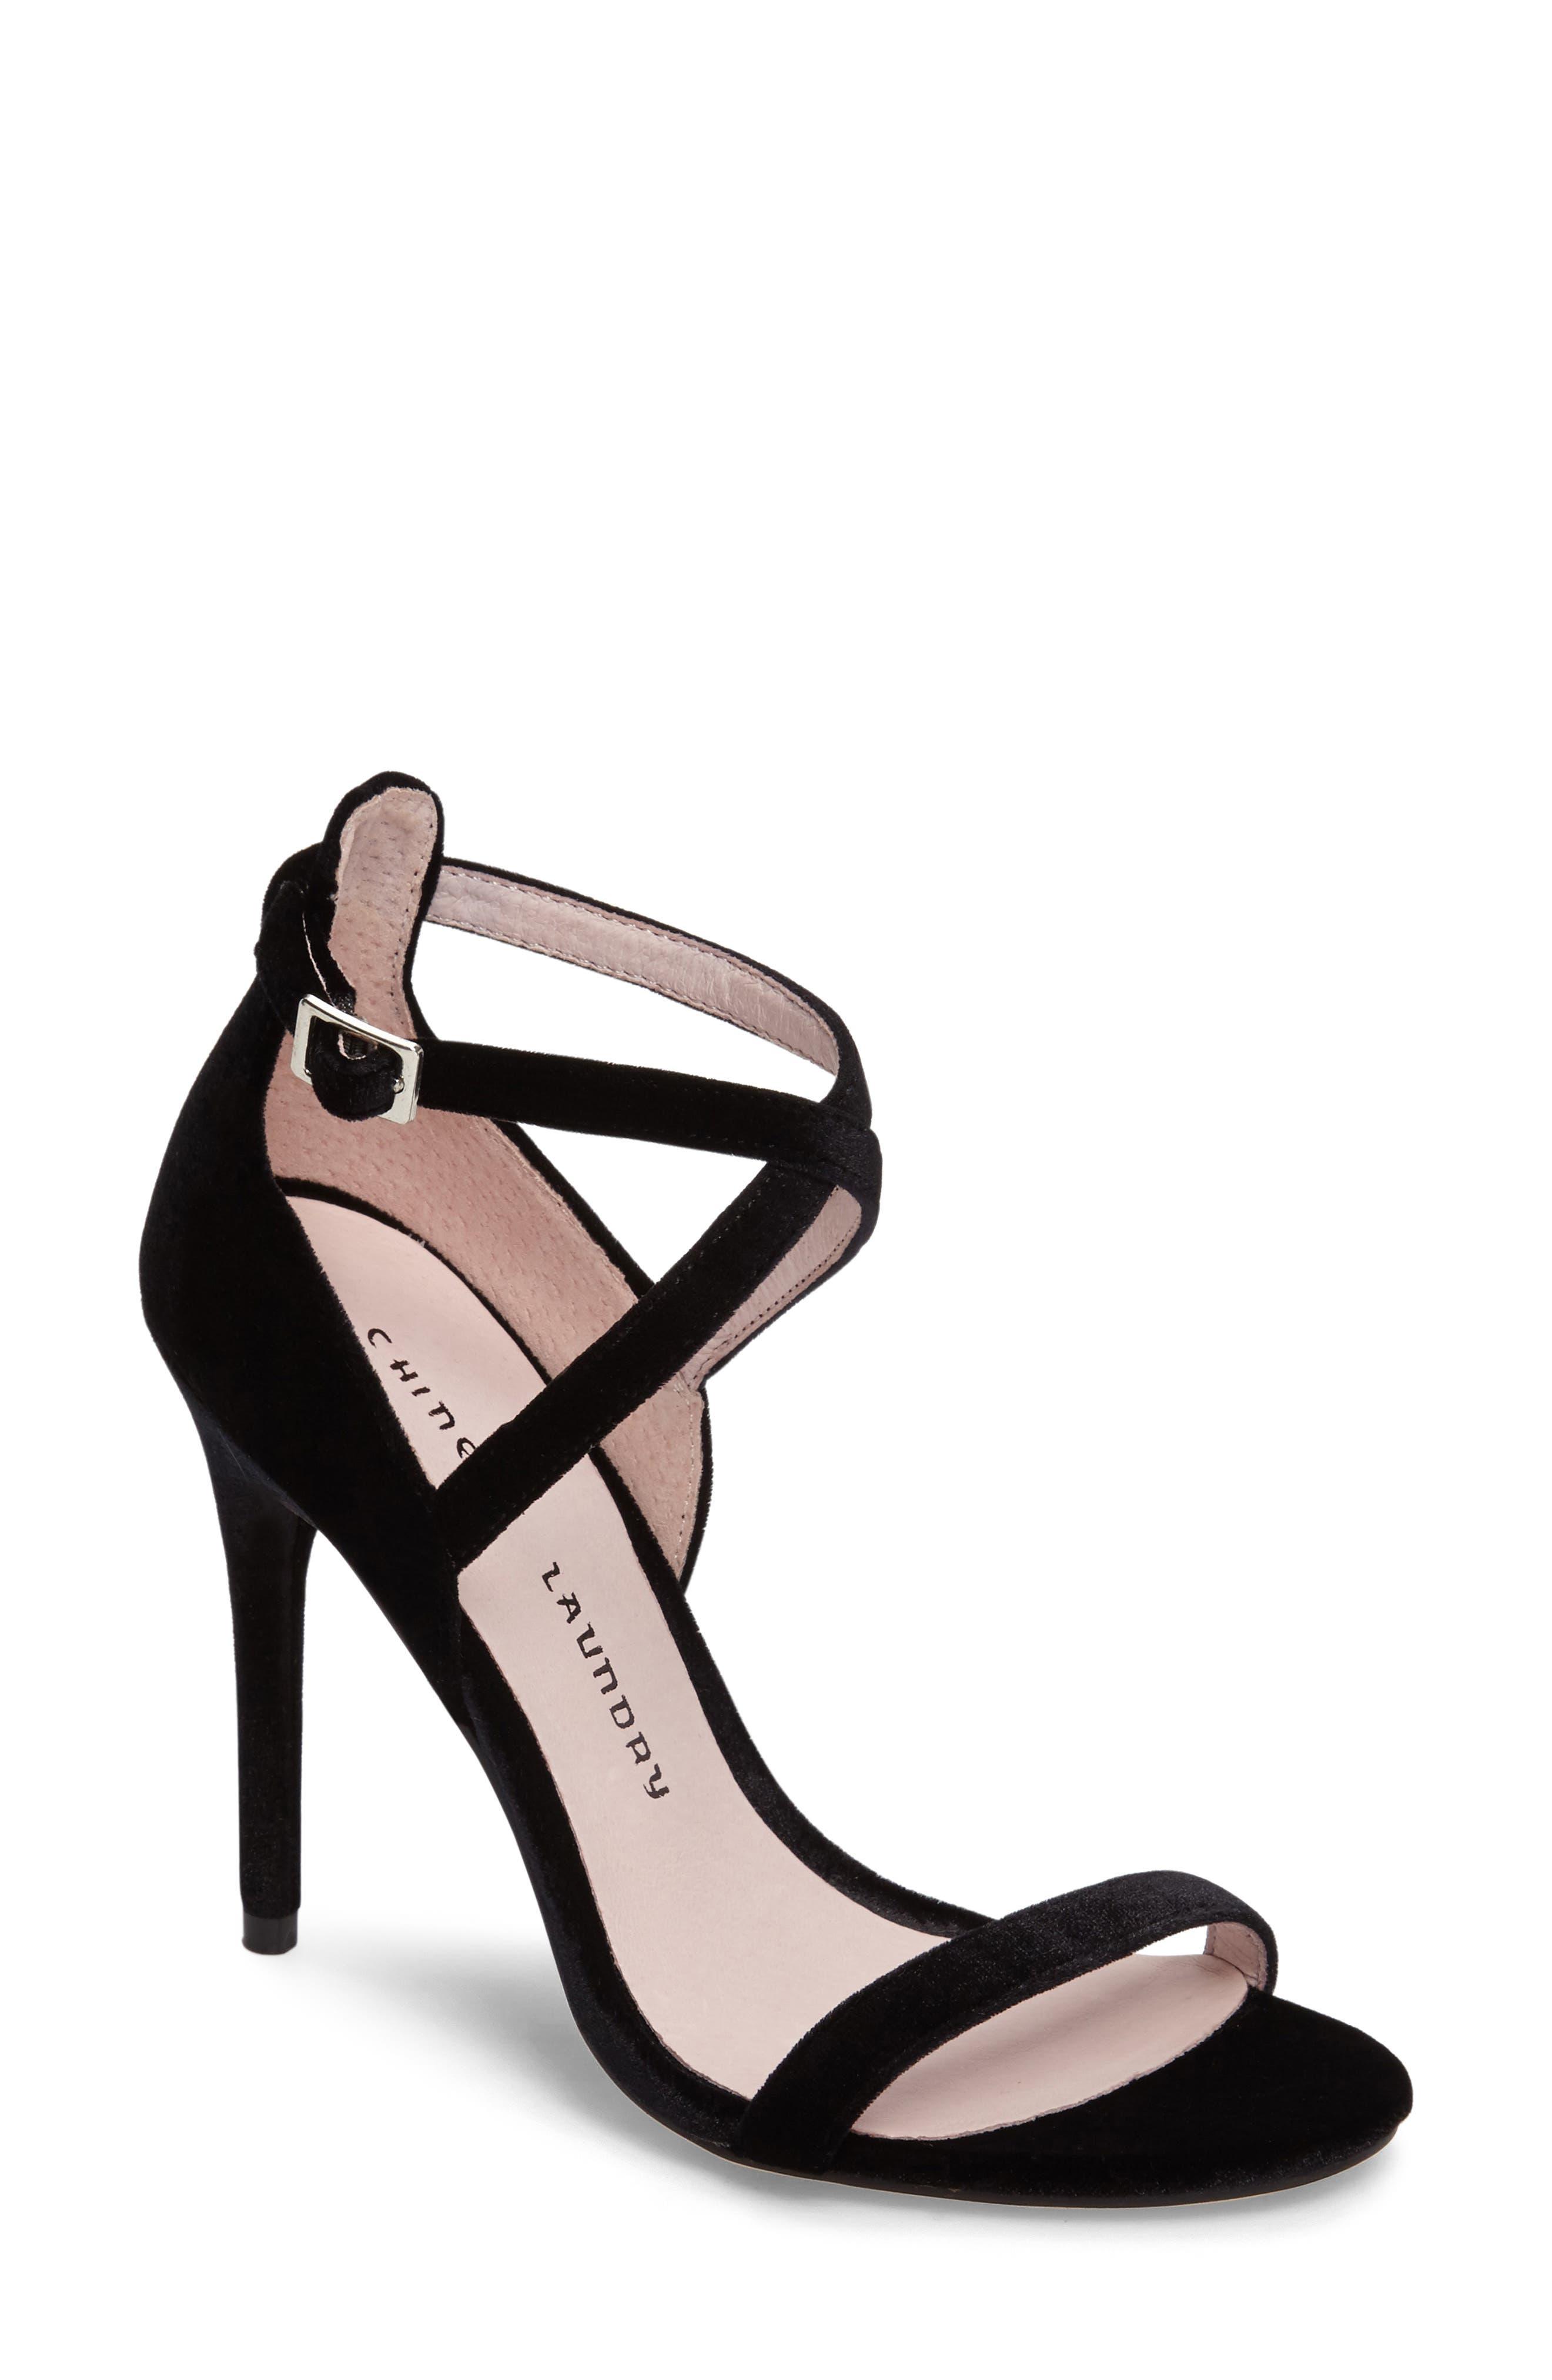 Lavelle Ankle Strap Sandal,                             Alternate thumbnail 2, color,                             001